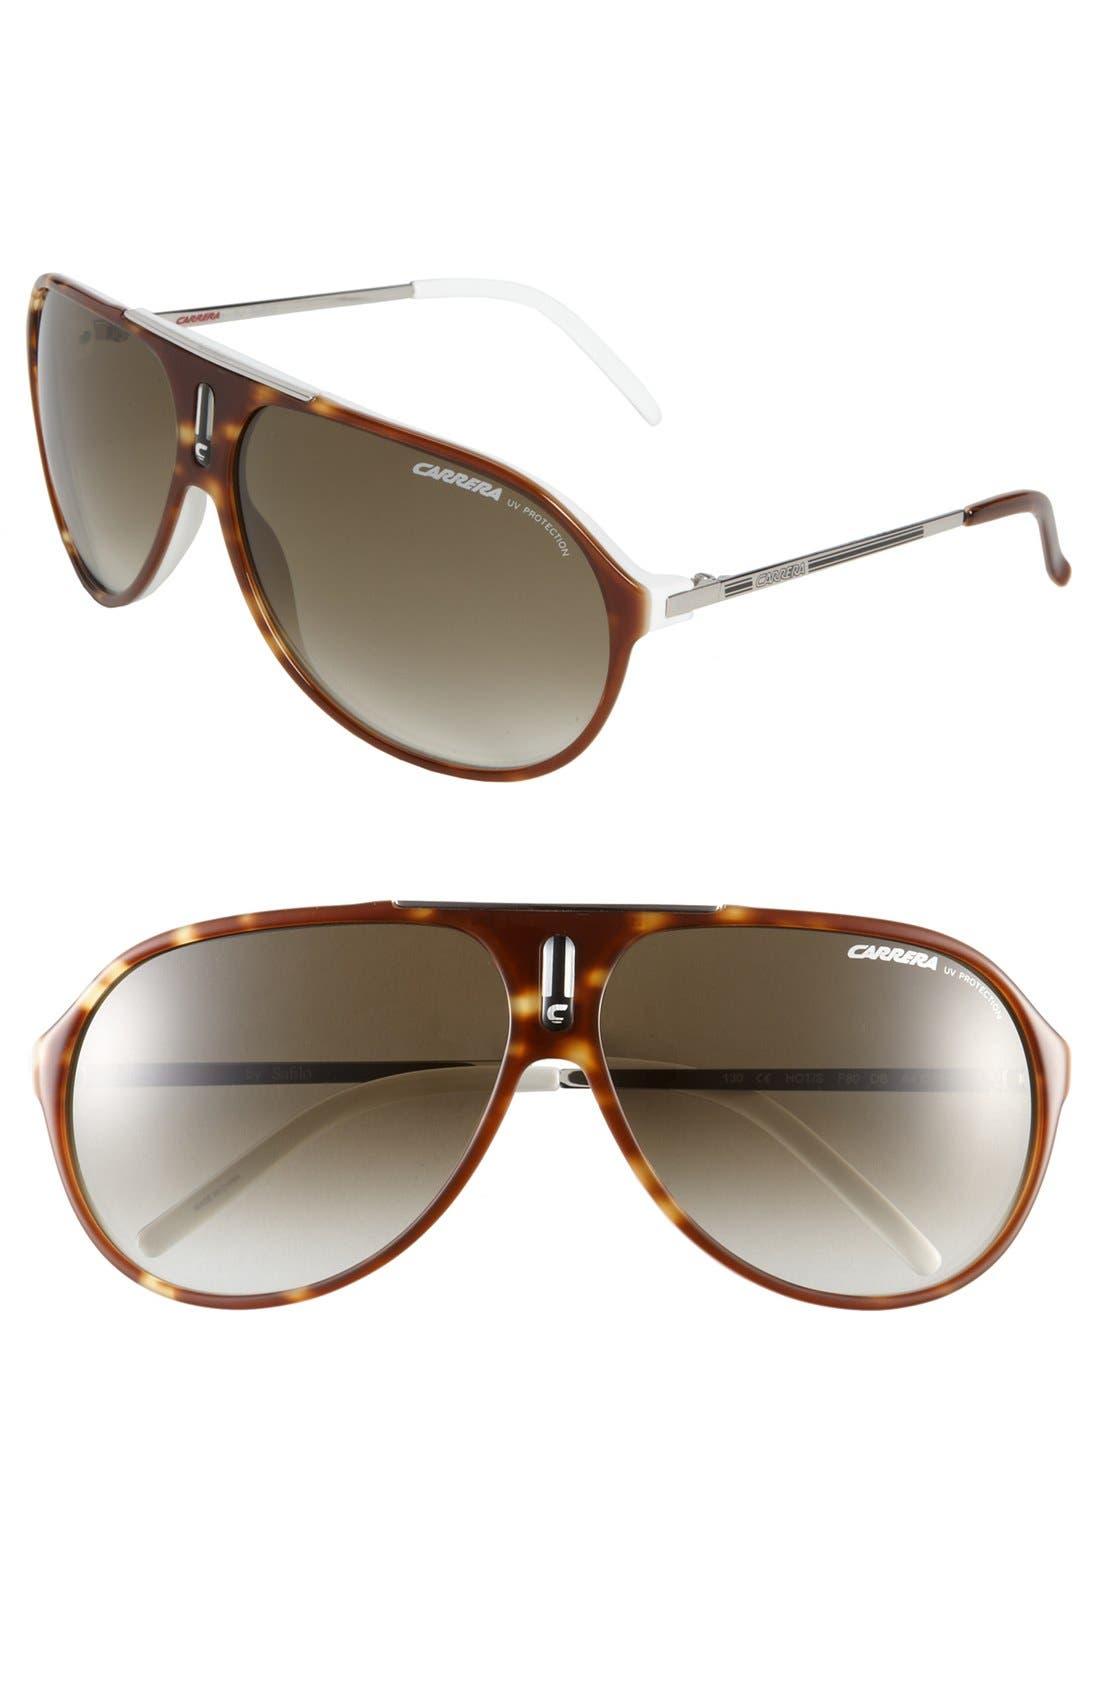 Main Image - Carrera Eyewear 'Hots' 64mm Aviator Sunglasses